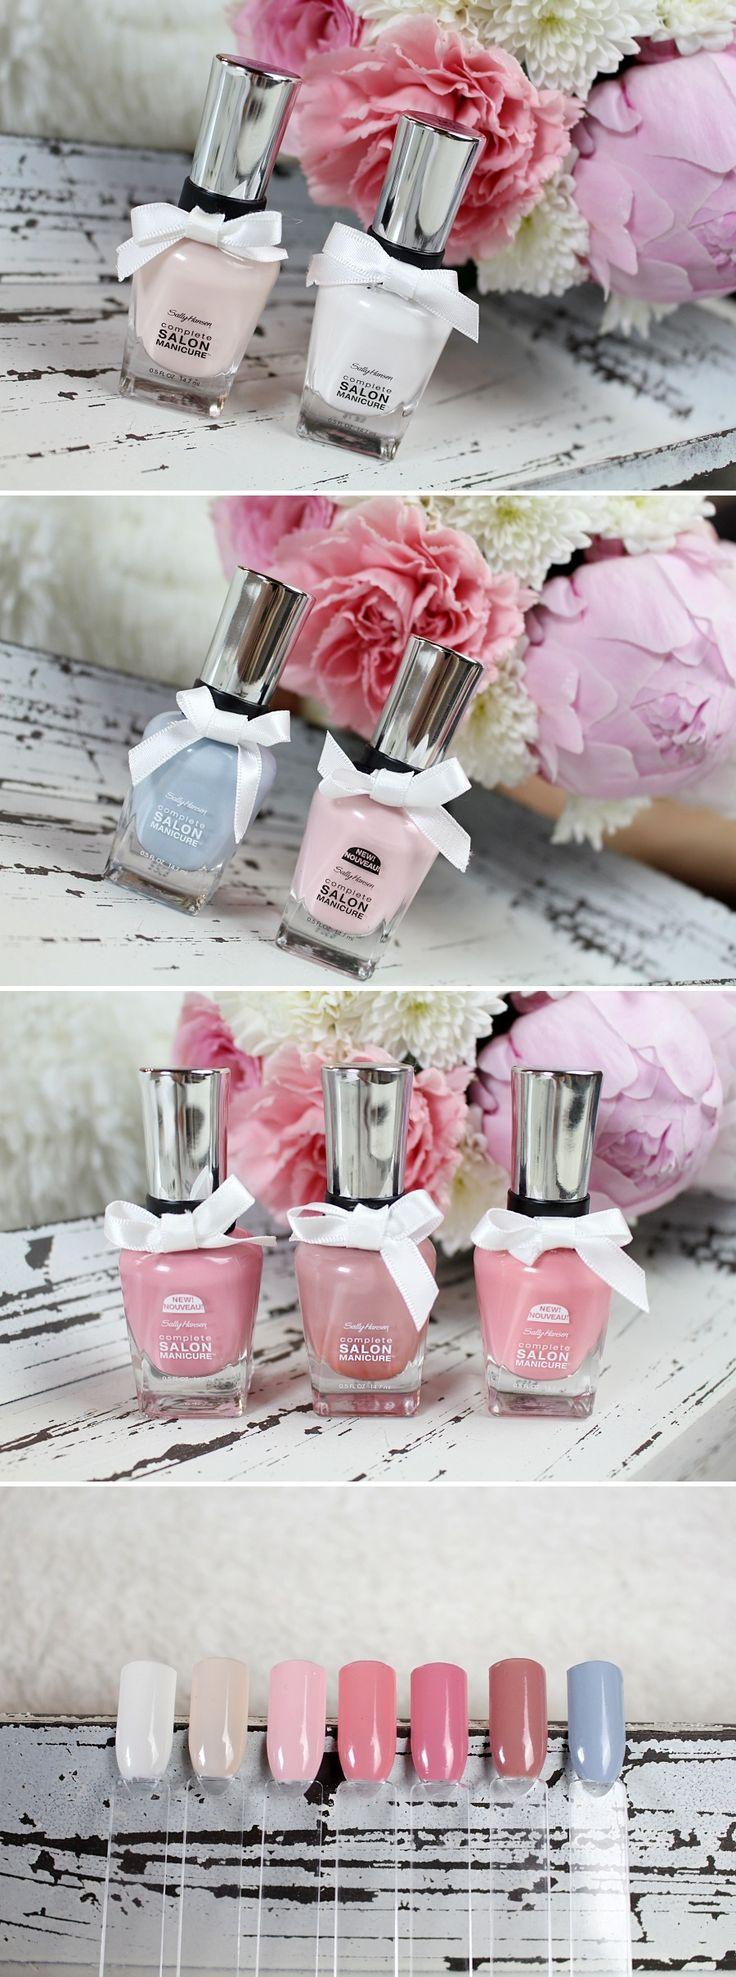 #SallyHansen Hochzeitskollektion  Farben: Let's Snow, Sweet Talker, Stellar Style Pink Pong, Style Icon, No Ifs Ands or Buds, In Full Blue-m